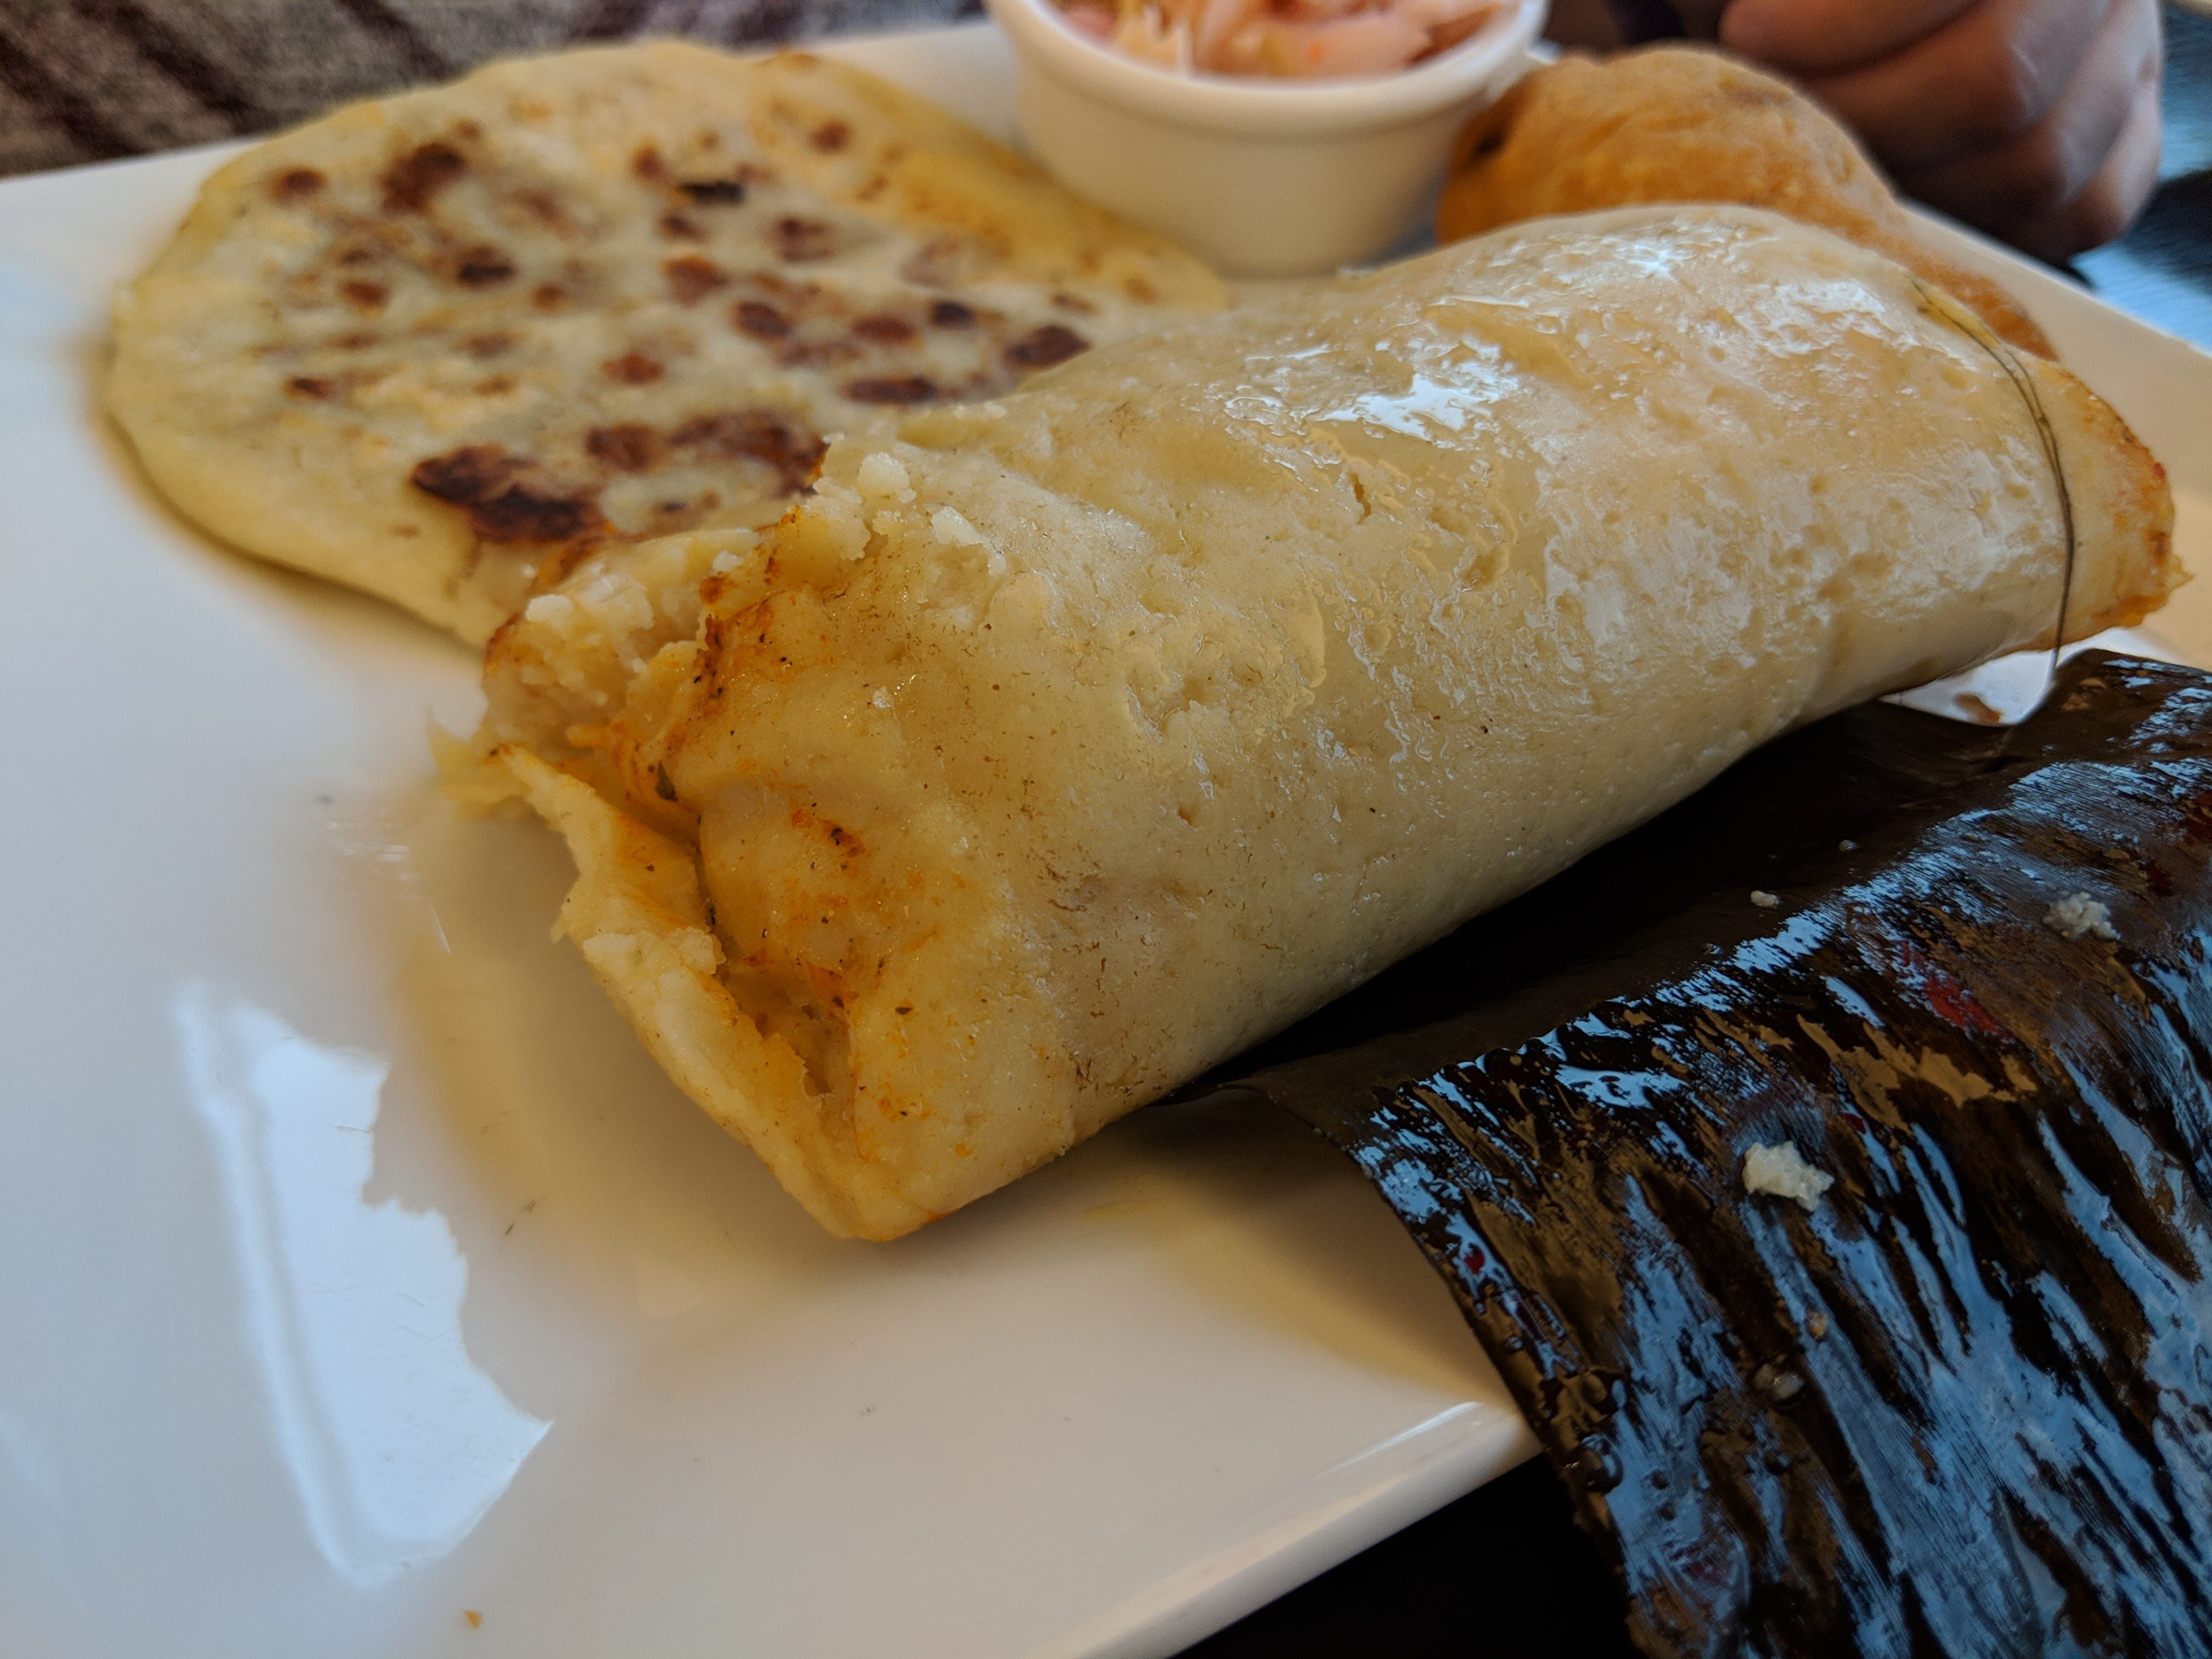 Tamales Salvadorenos at Emanuel #3 Salvadorian and Mexican Restaurant at 902 Board St.